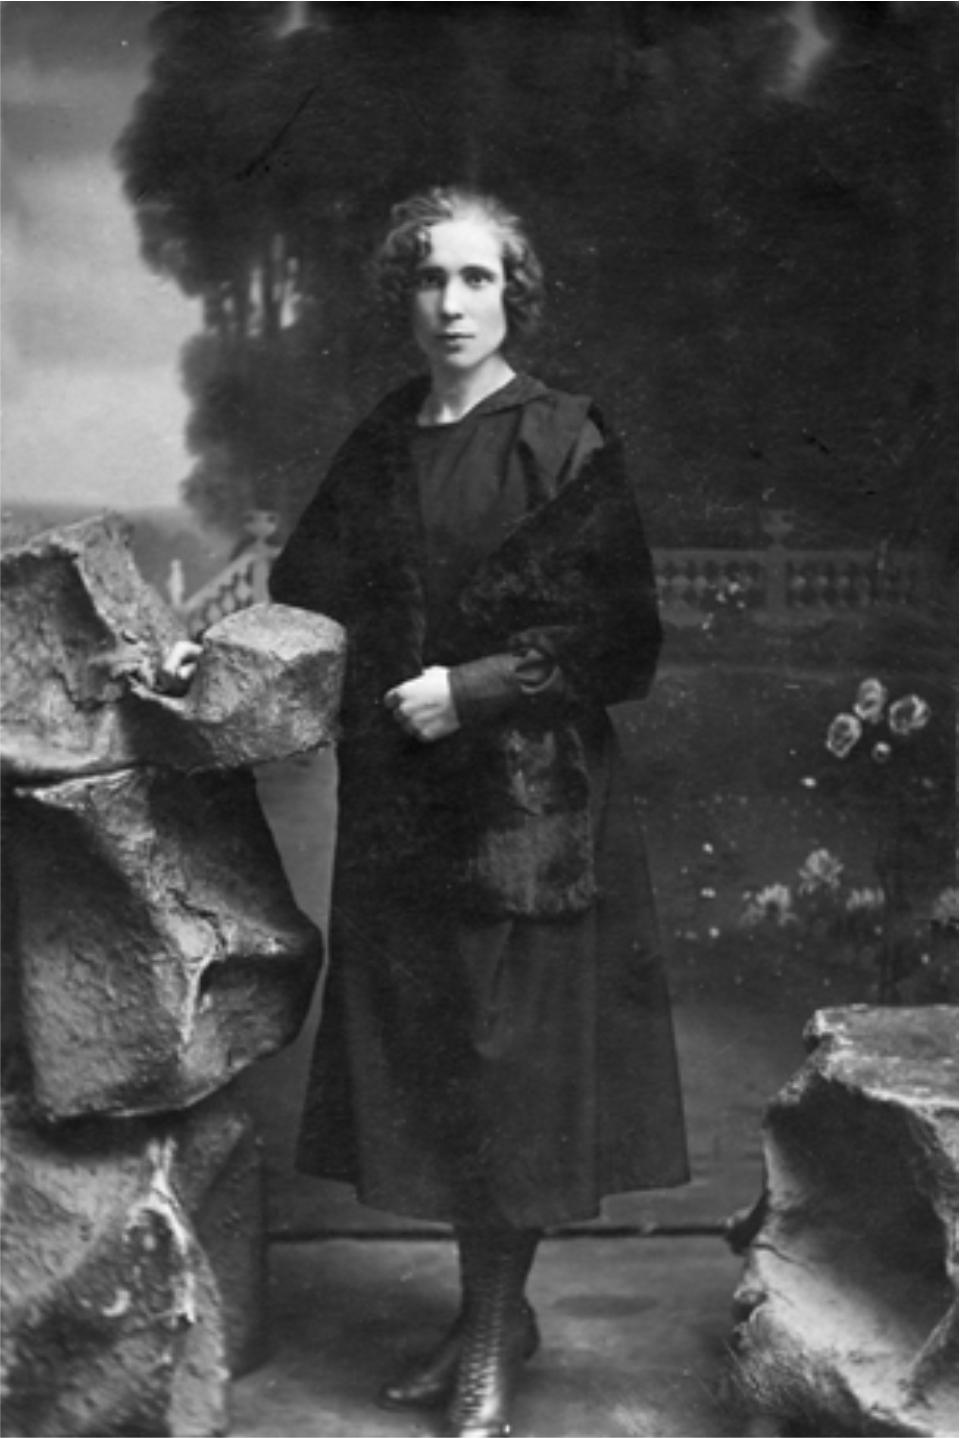 https://www.jmuseum.lt/uploads/userfiles/zuvanciuju_gelbejimo_kryziaus/1923-06-07_Adelė-Milvidaitė__Alytus.jpg